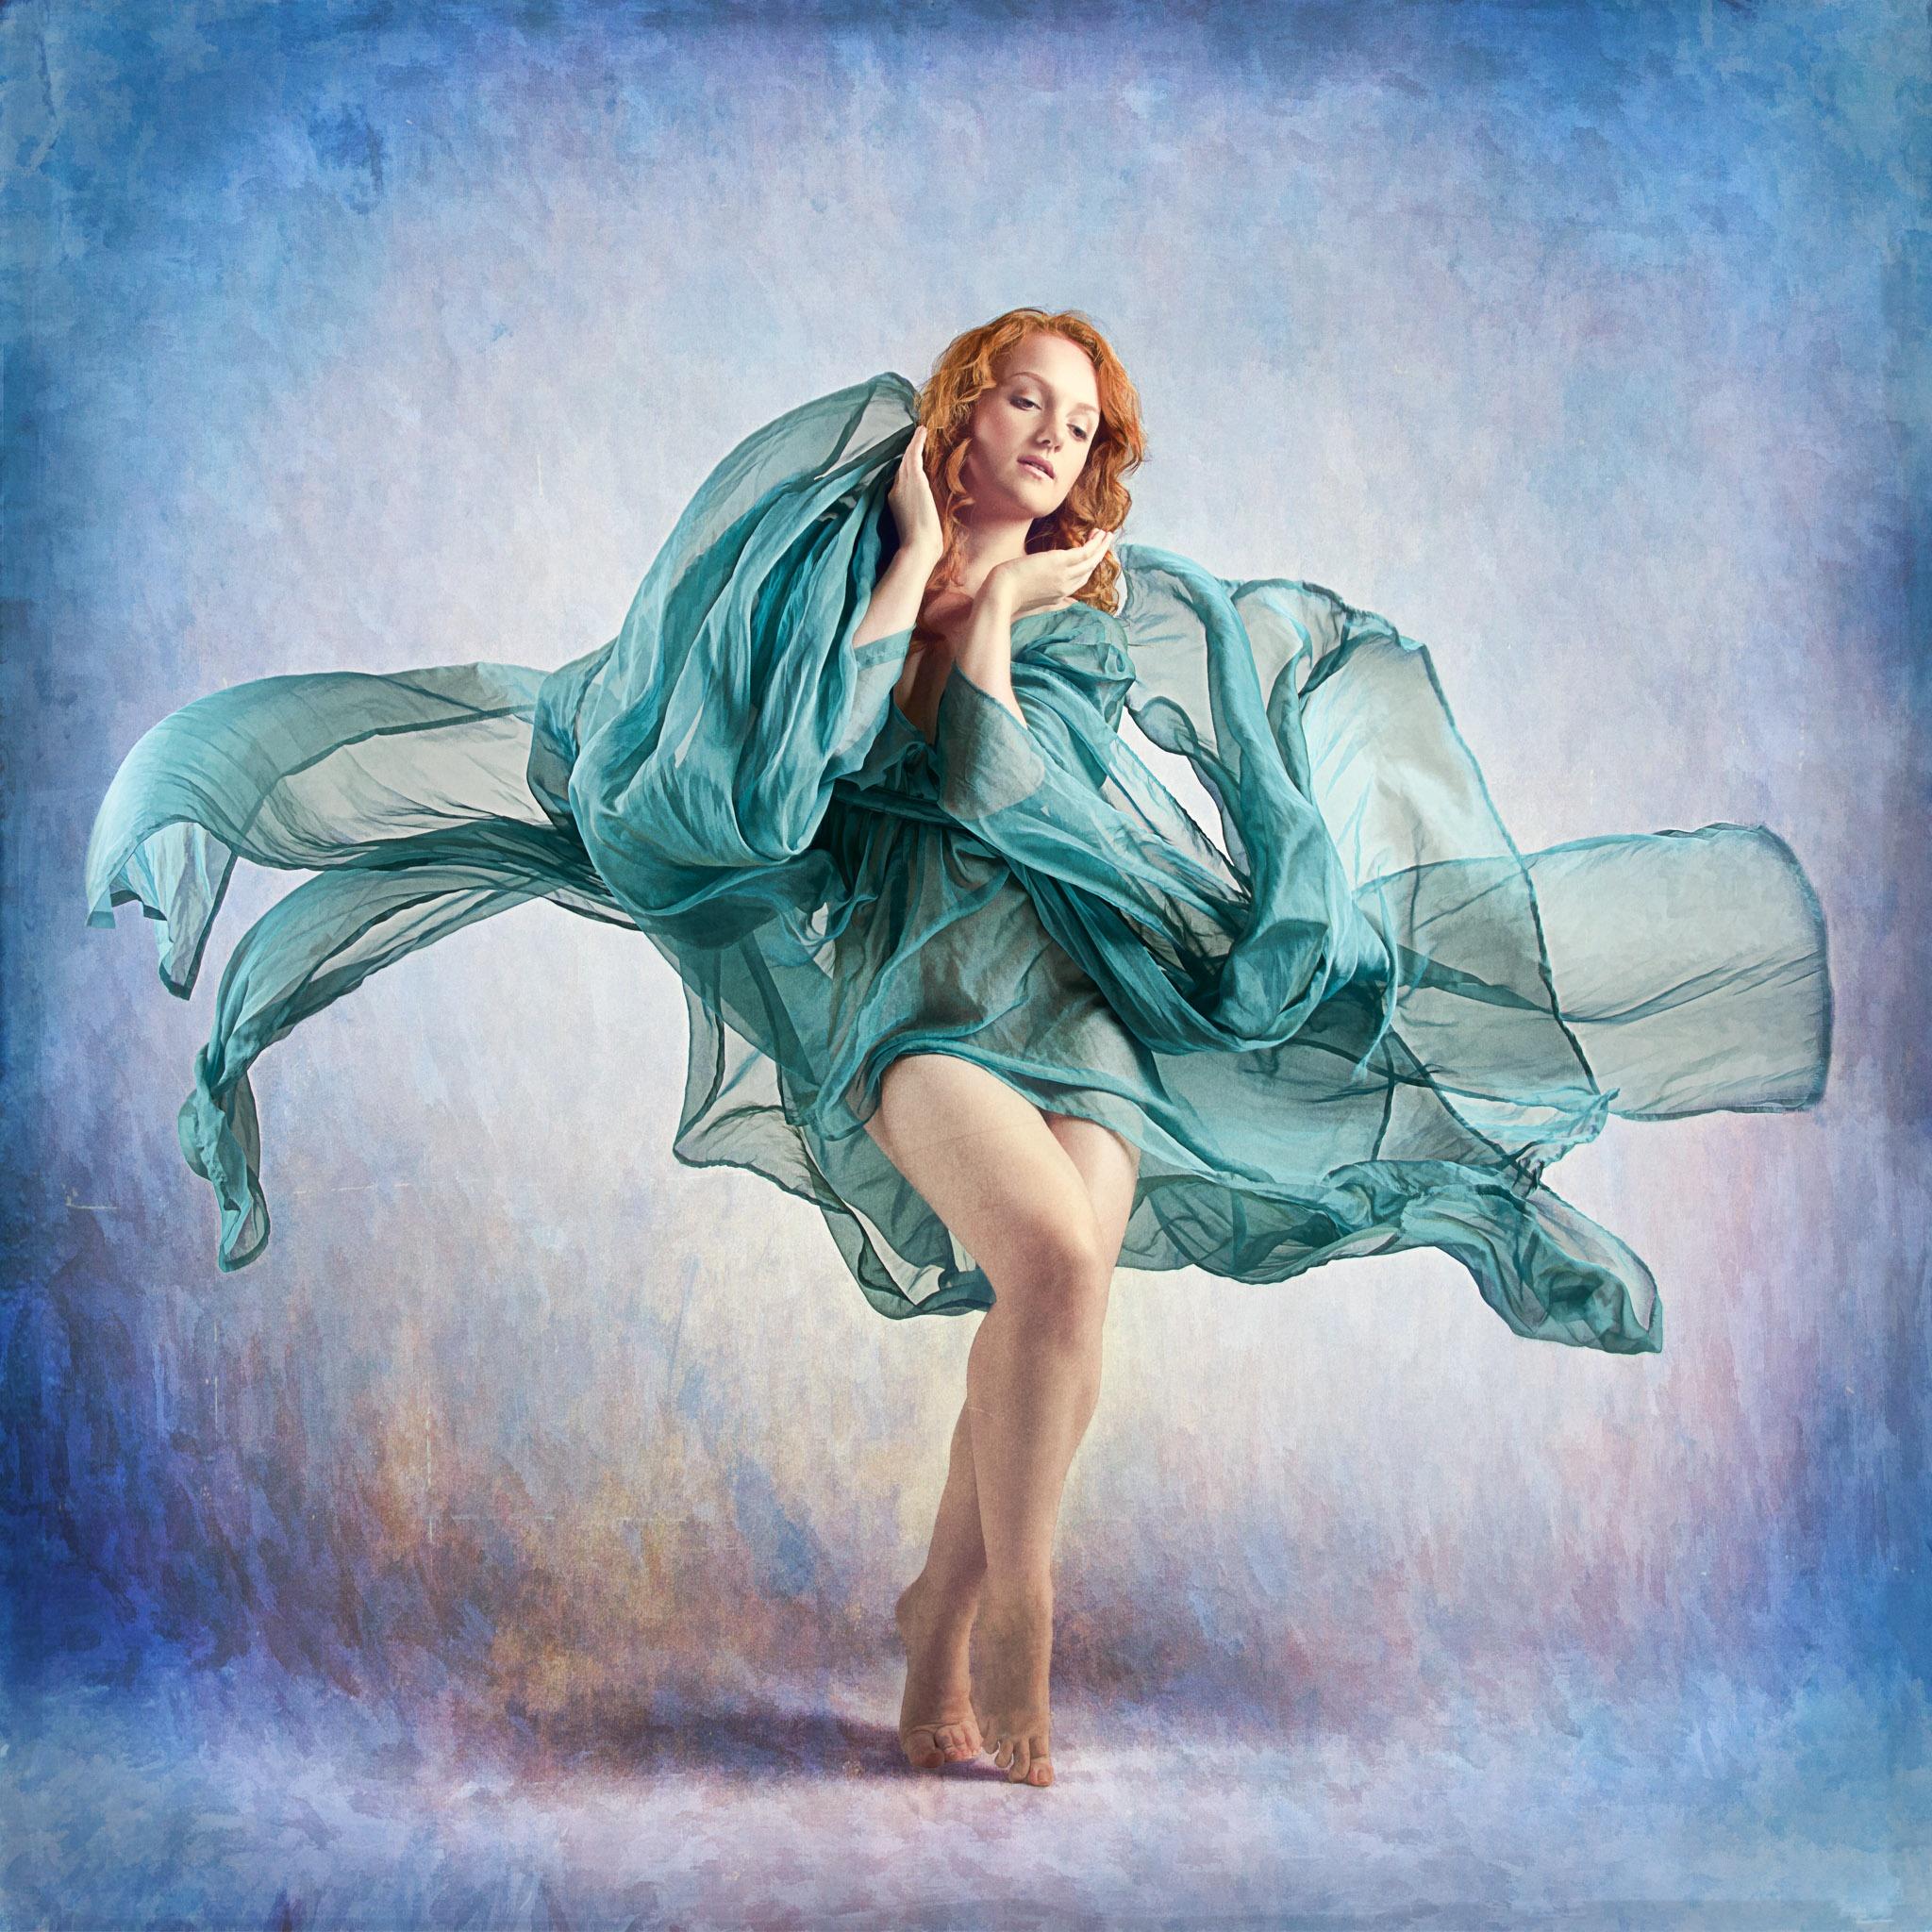 Blue Flames by John McNairn